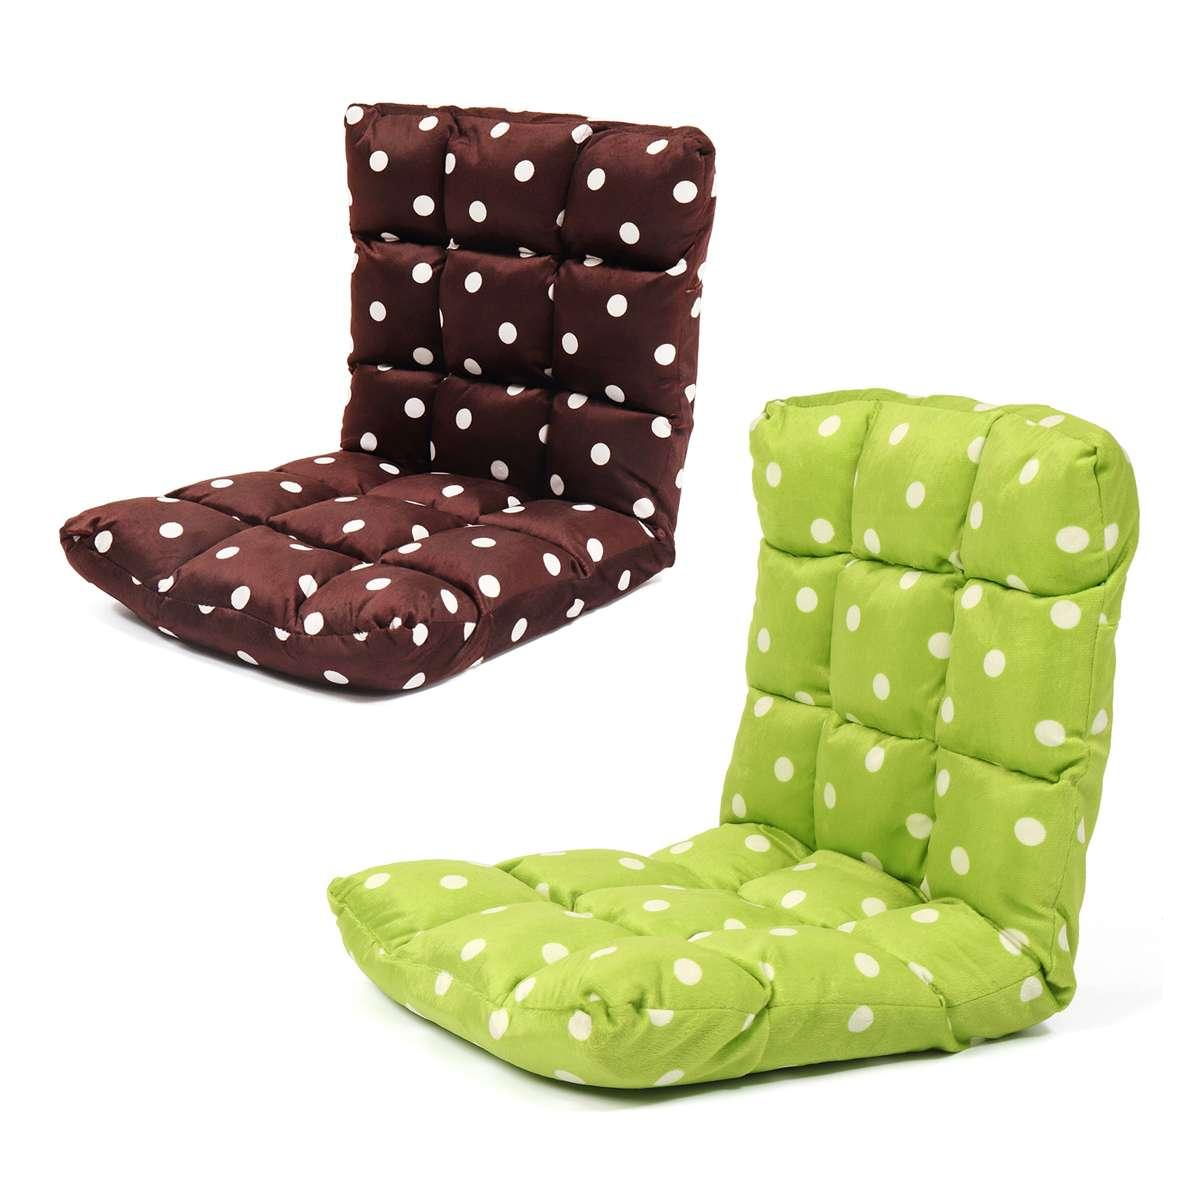 95x35x13cm Recliner Lounge Sofa Bed Bean Bag Sofas Home Balcony Casual Cushion Chair Pads Windows Tatami Floor Mat 2 Colors